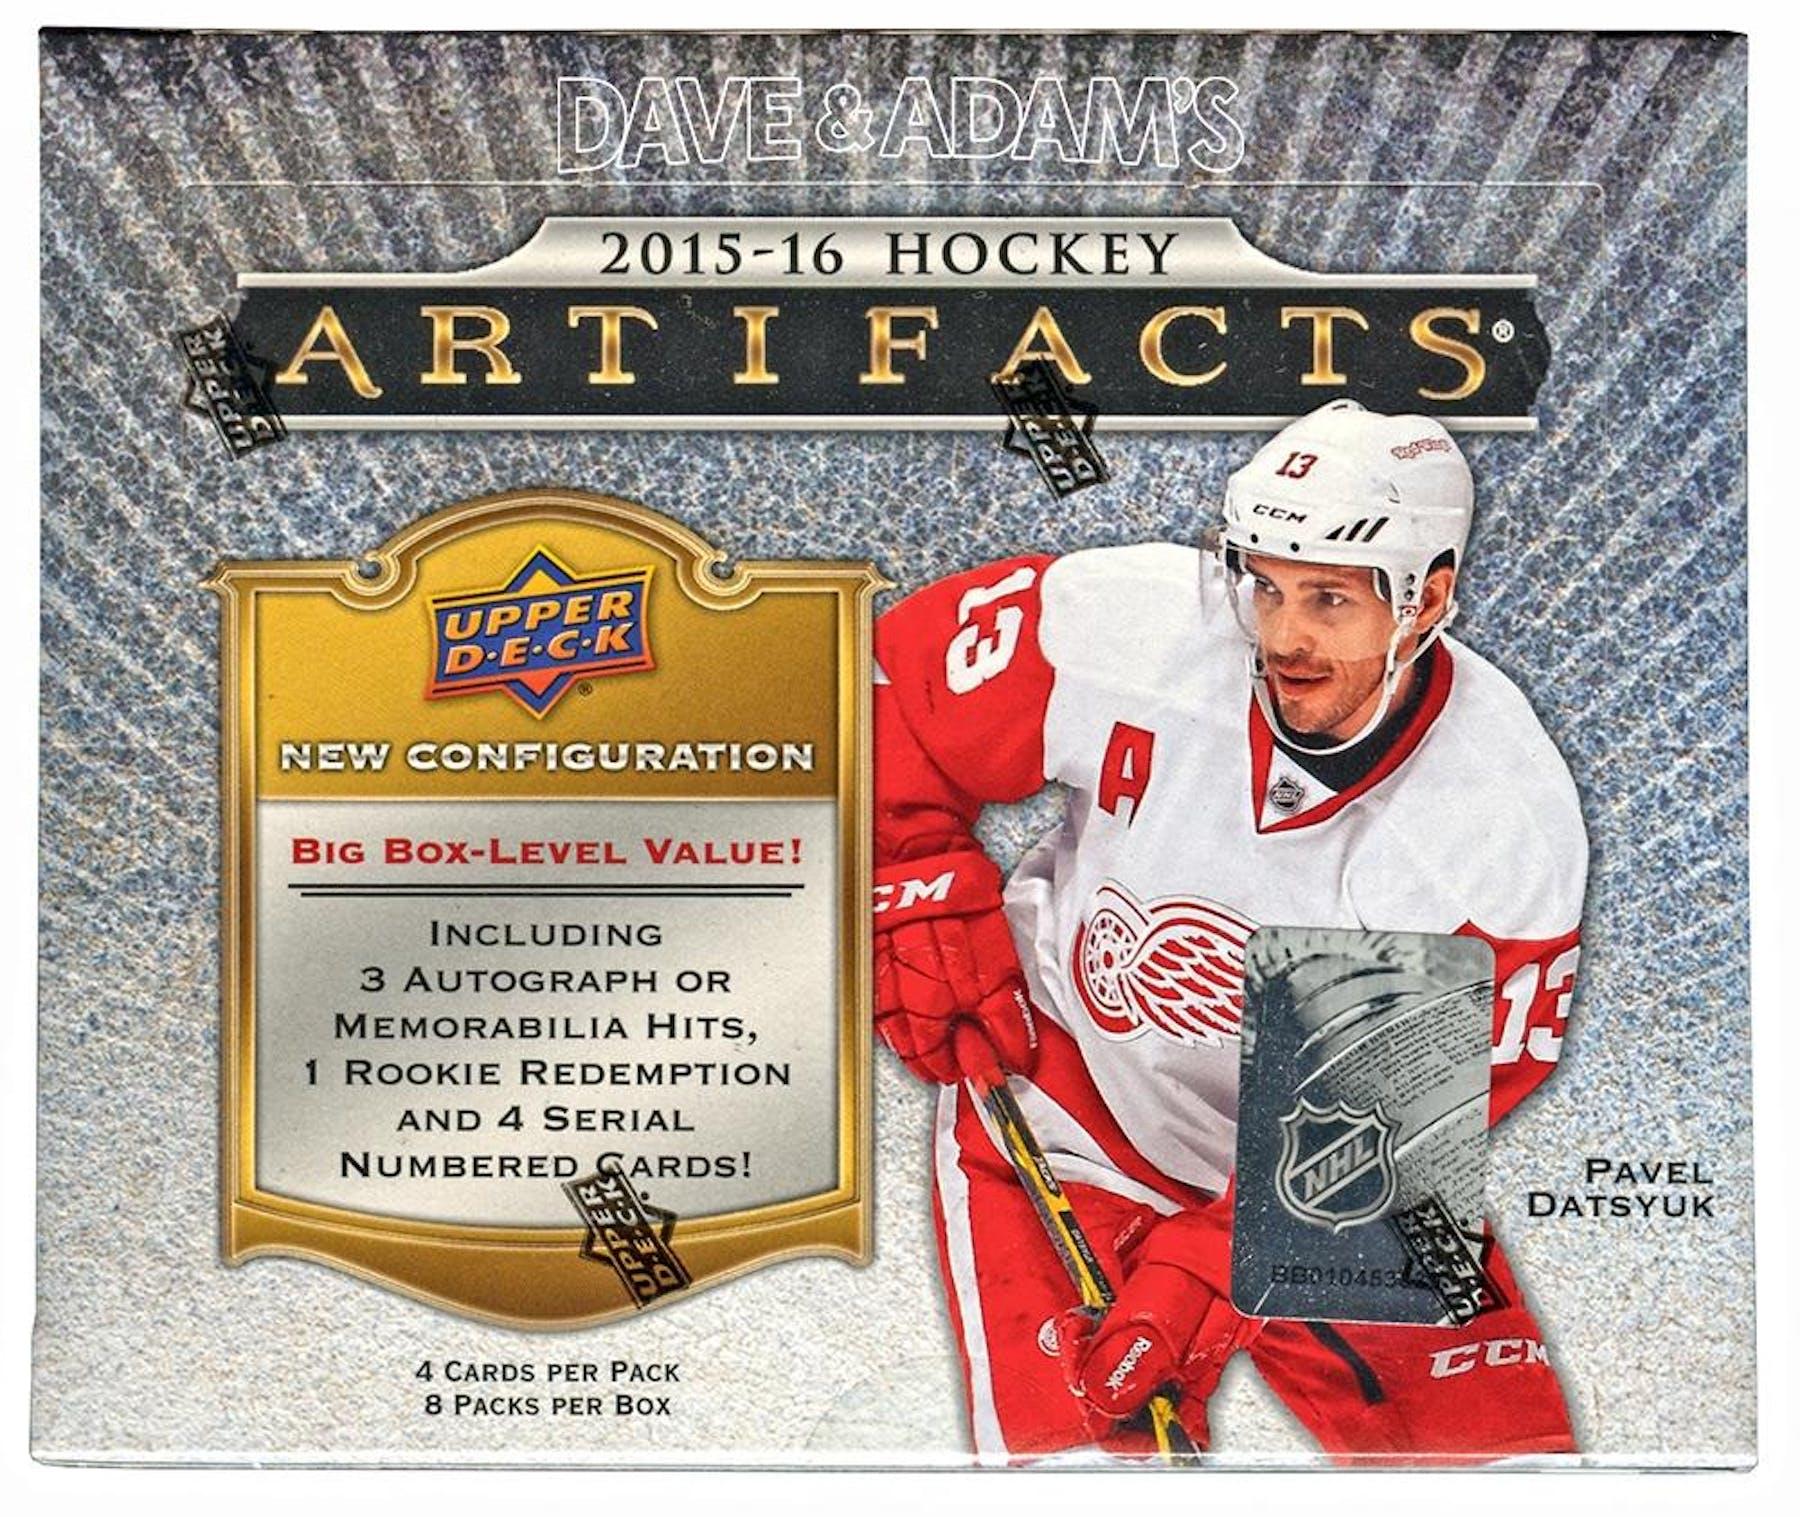 2015 16 Upper Deck Artifacts Hockey Hobby Box  441ecef68